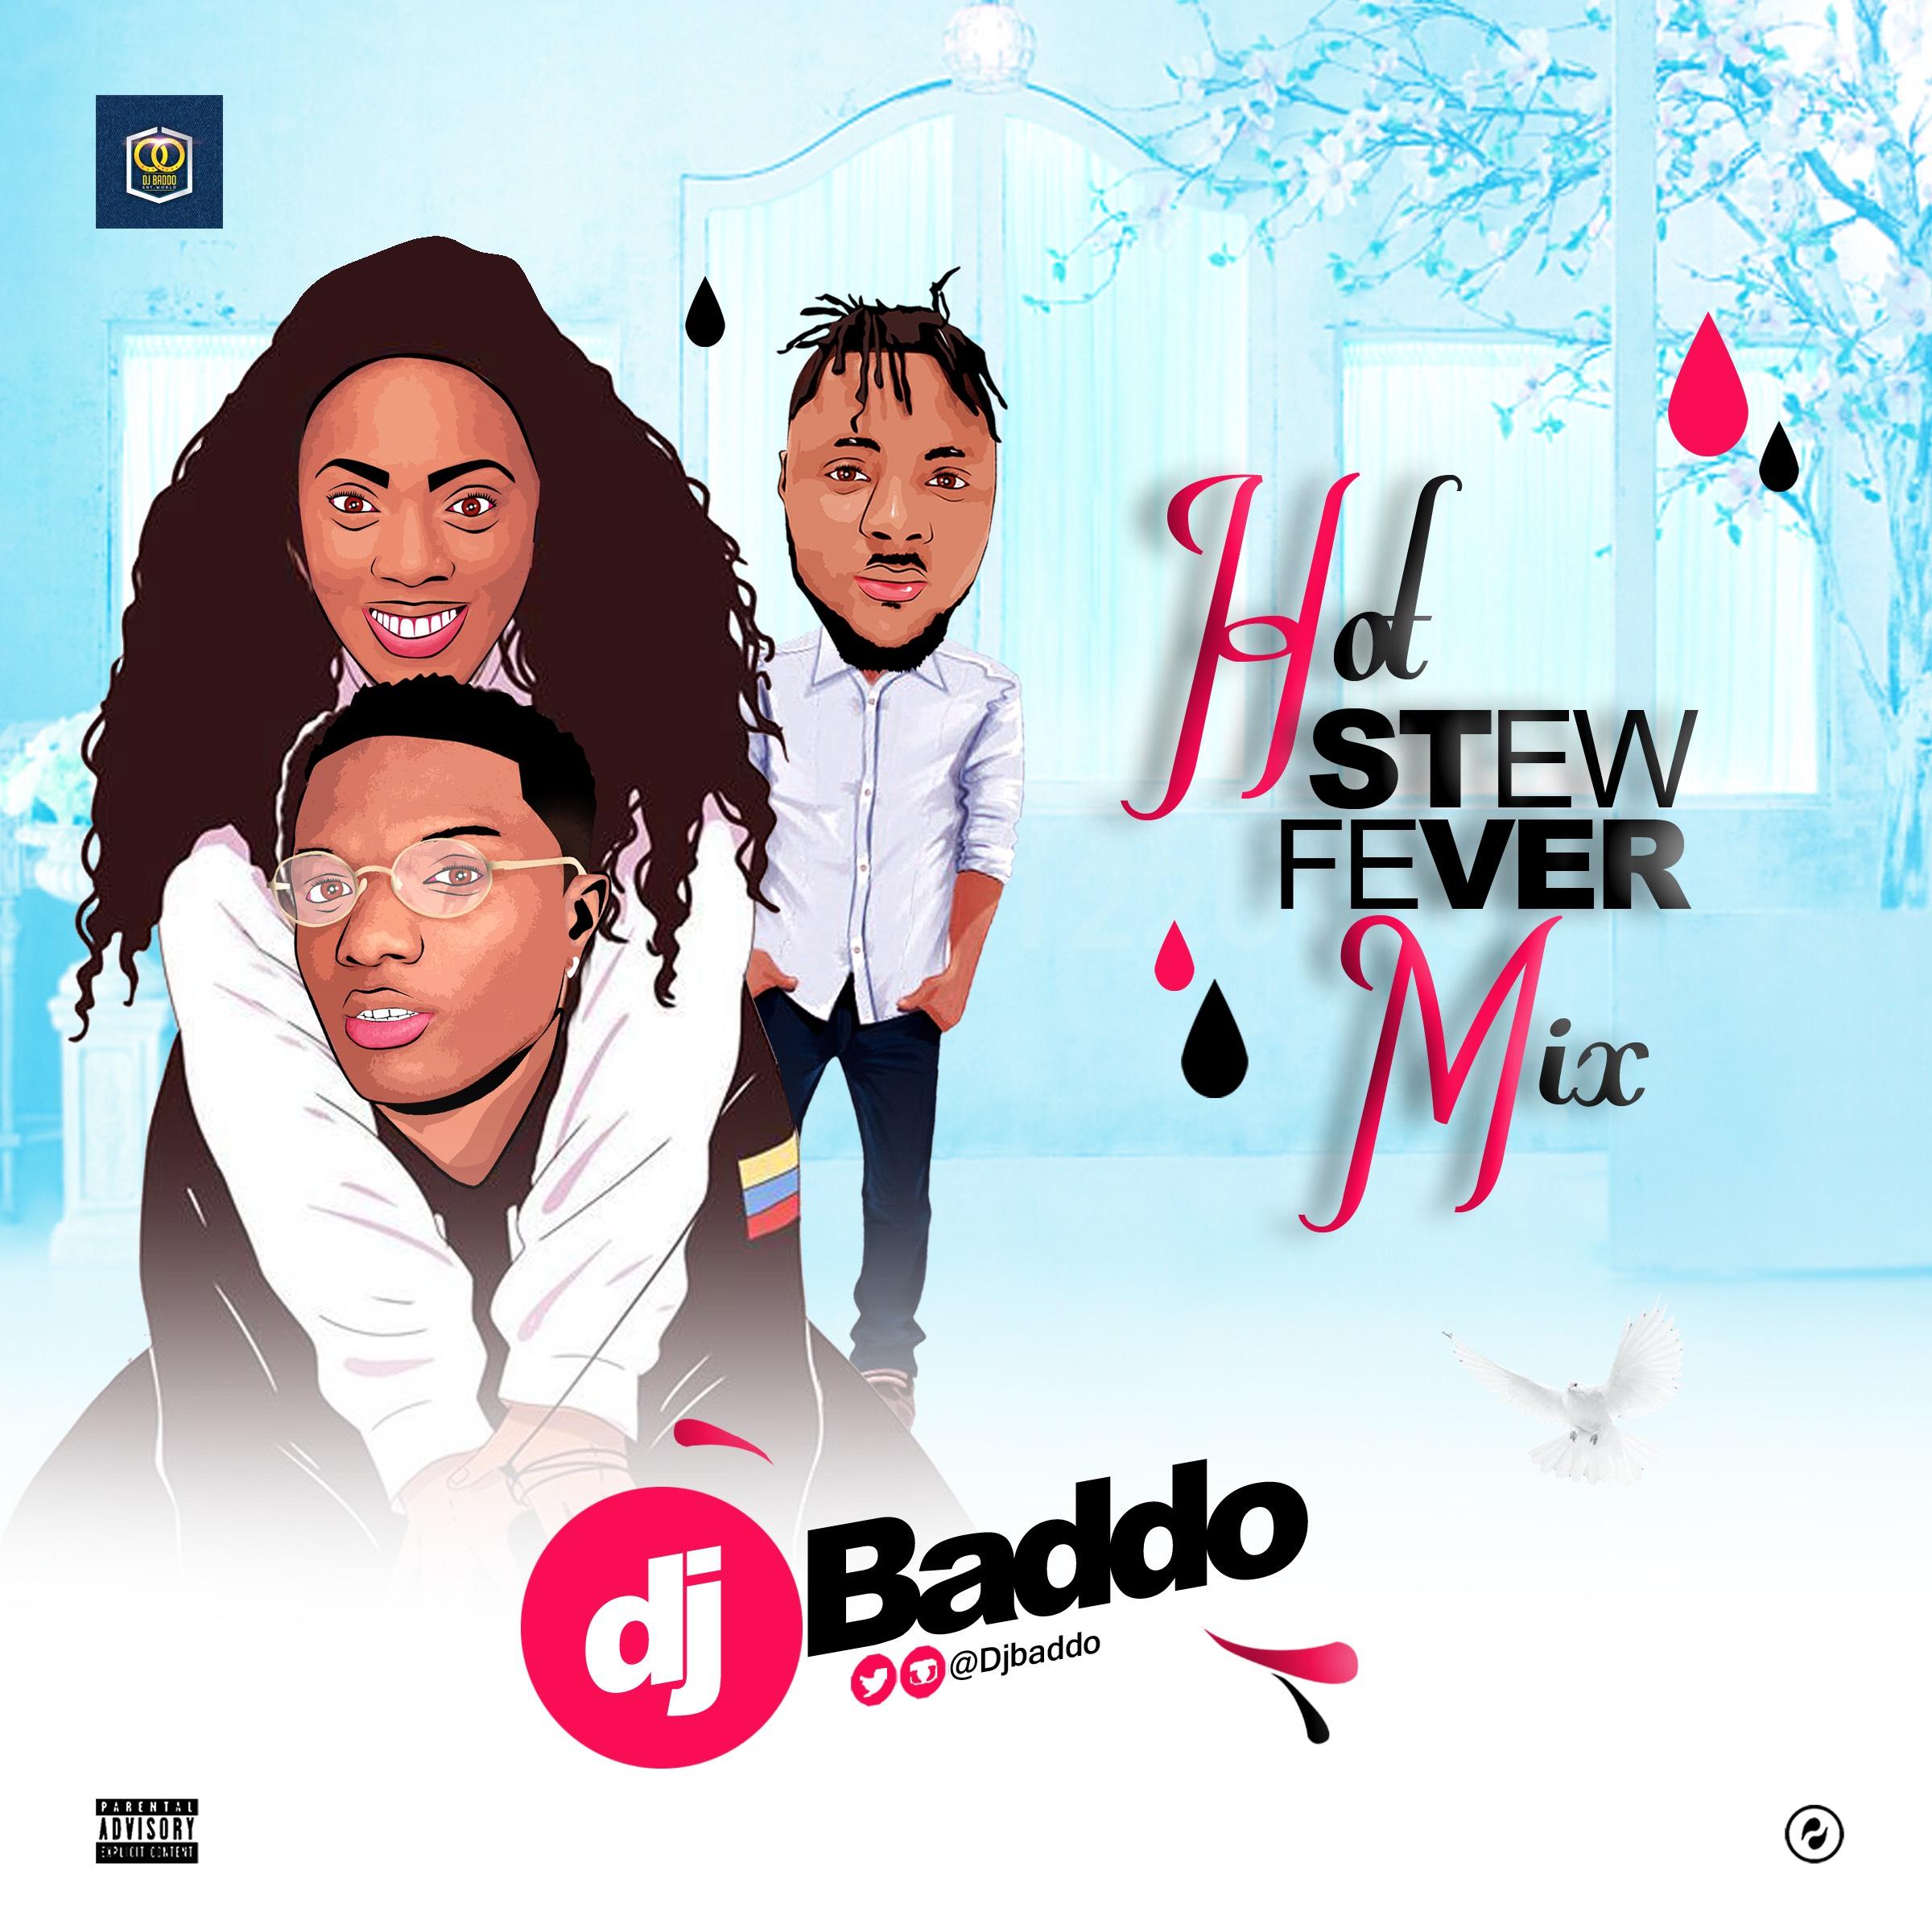 Dj Baddo Hot Stew Fever Mix